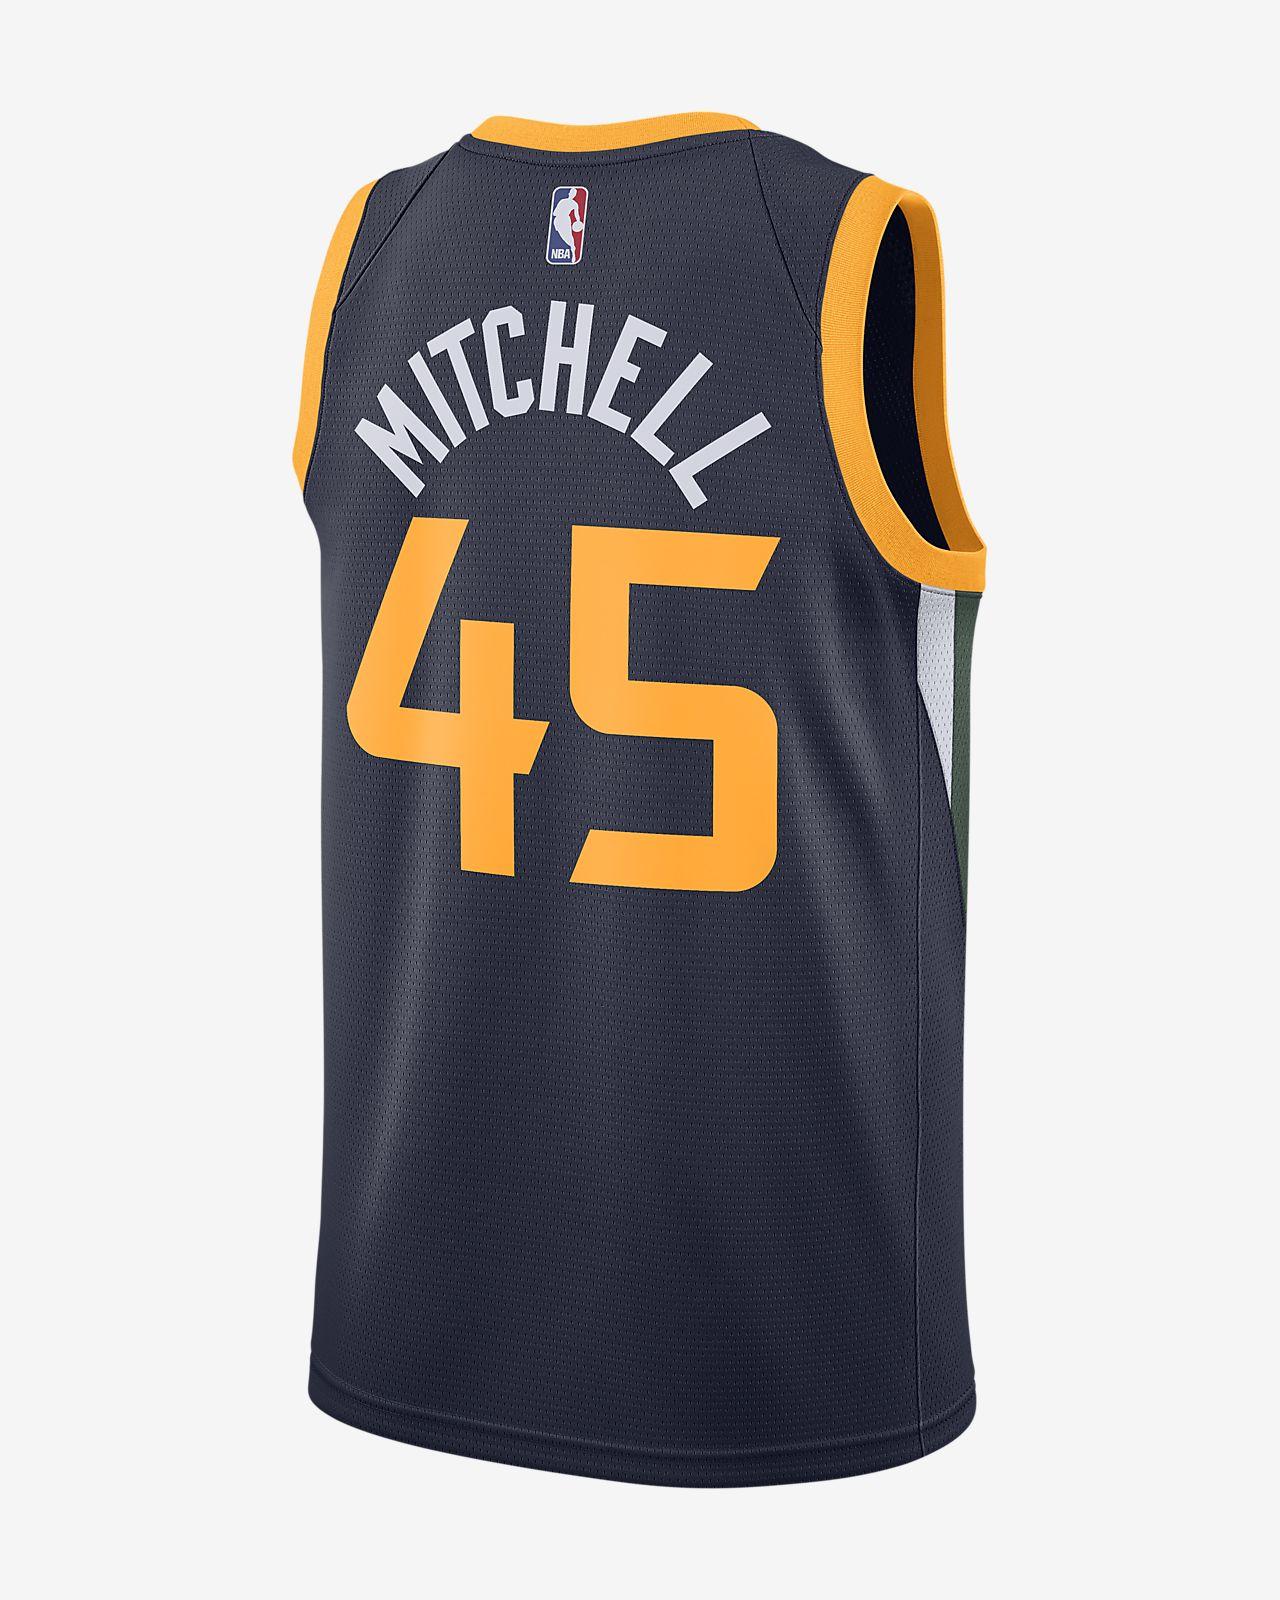 bc3438dd31f ... 犹他爵士队(Donovan Mitchell) Icon Edition Swingman Jersey Nike NBA Connected  Jersey 男子